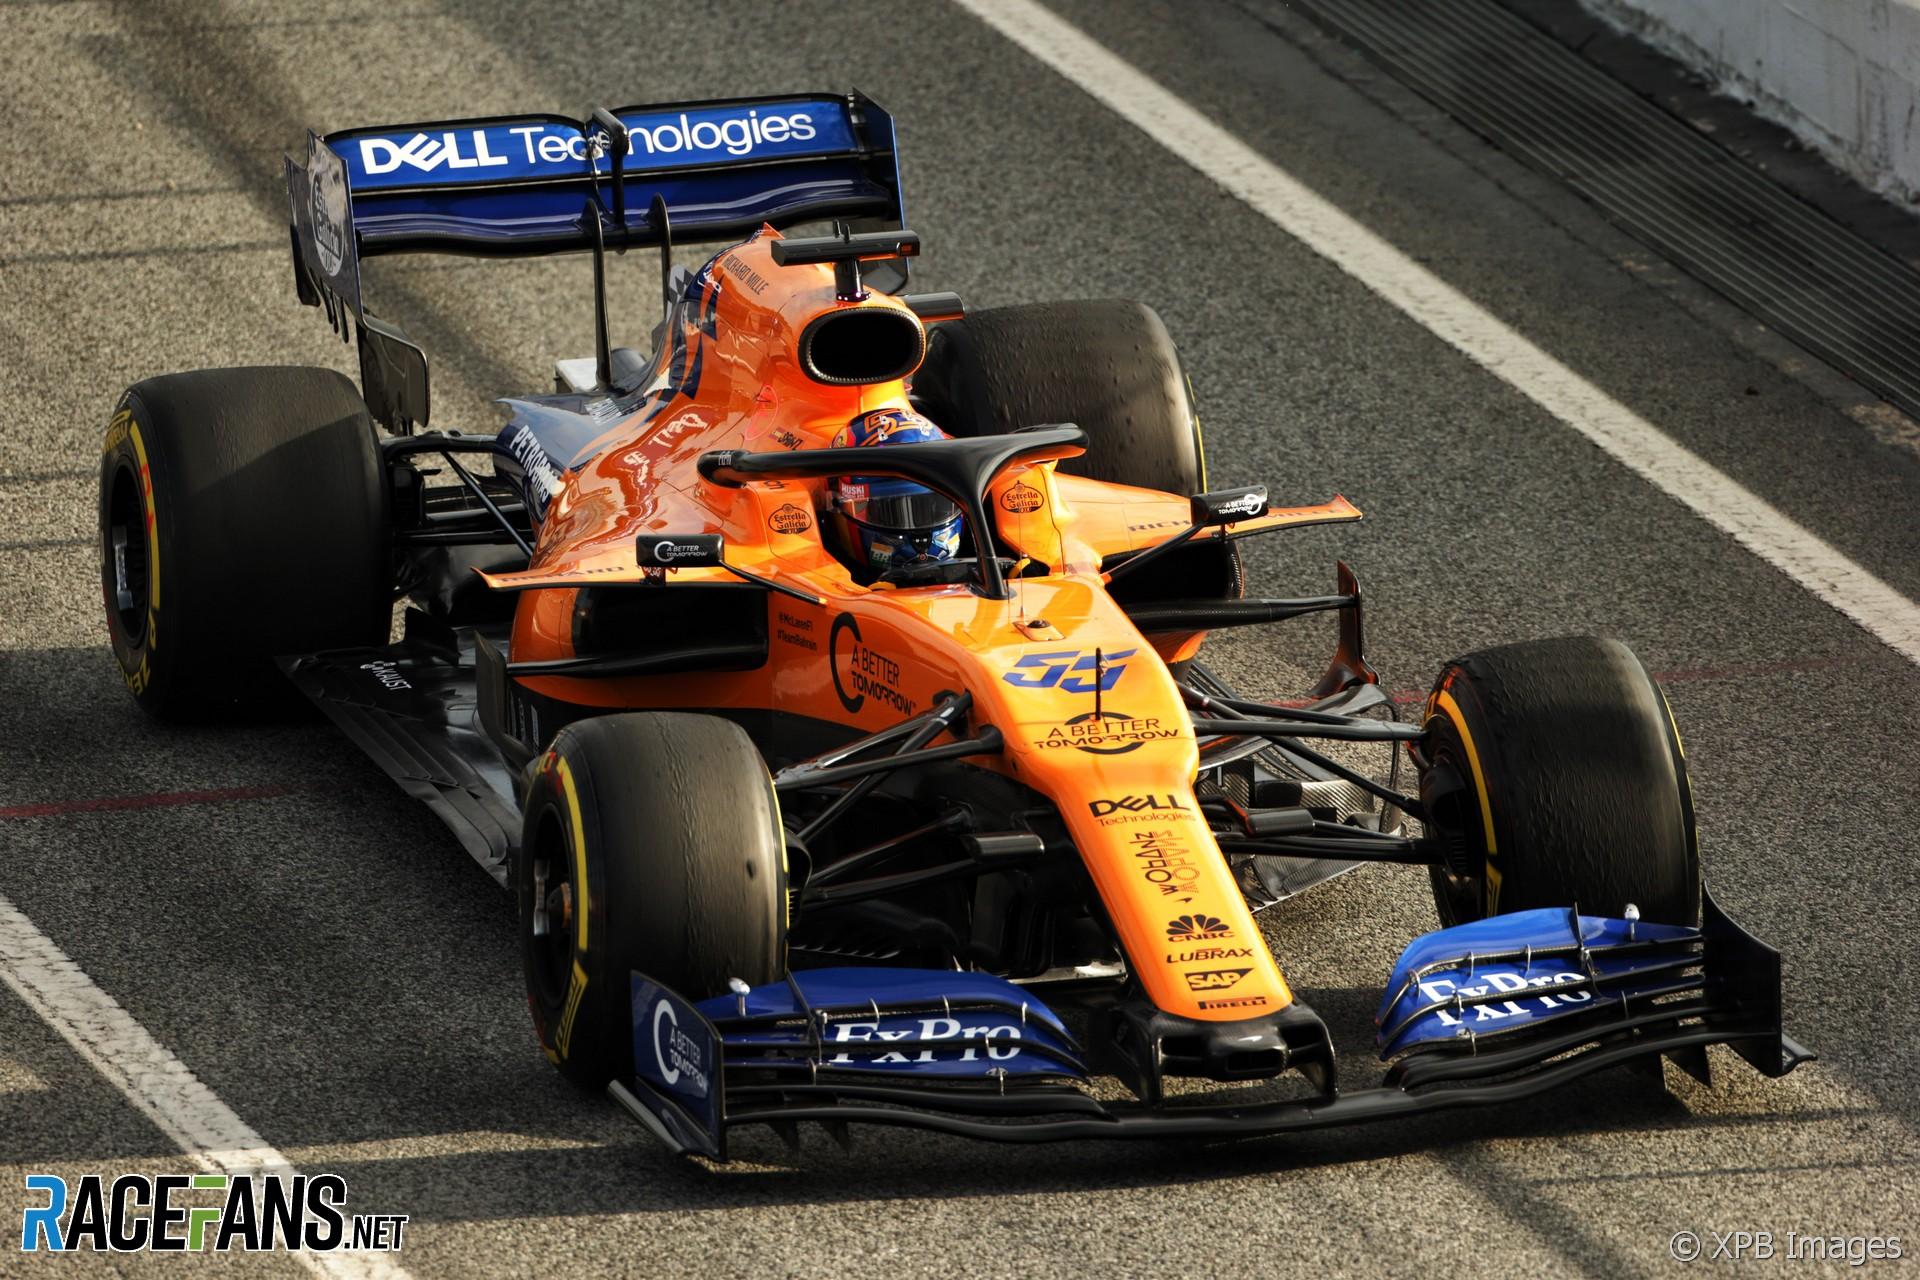 Mclaren Mcl34 2019 F1 Car Technical Analysis Racefans